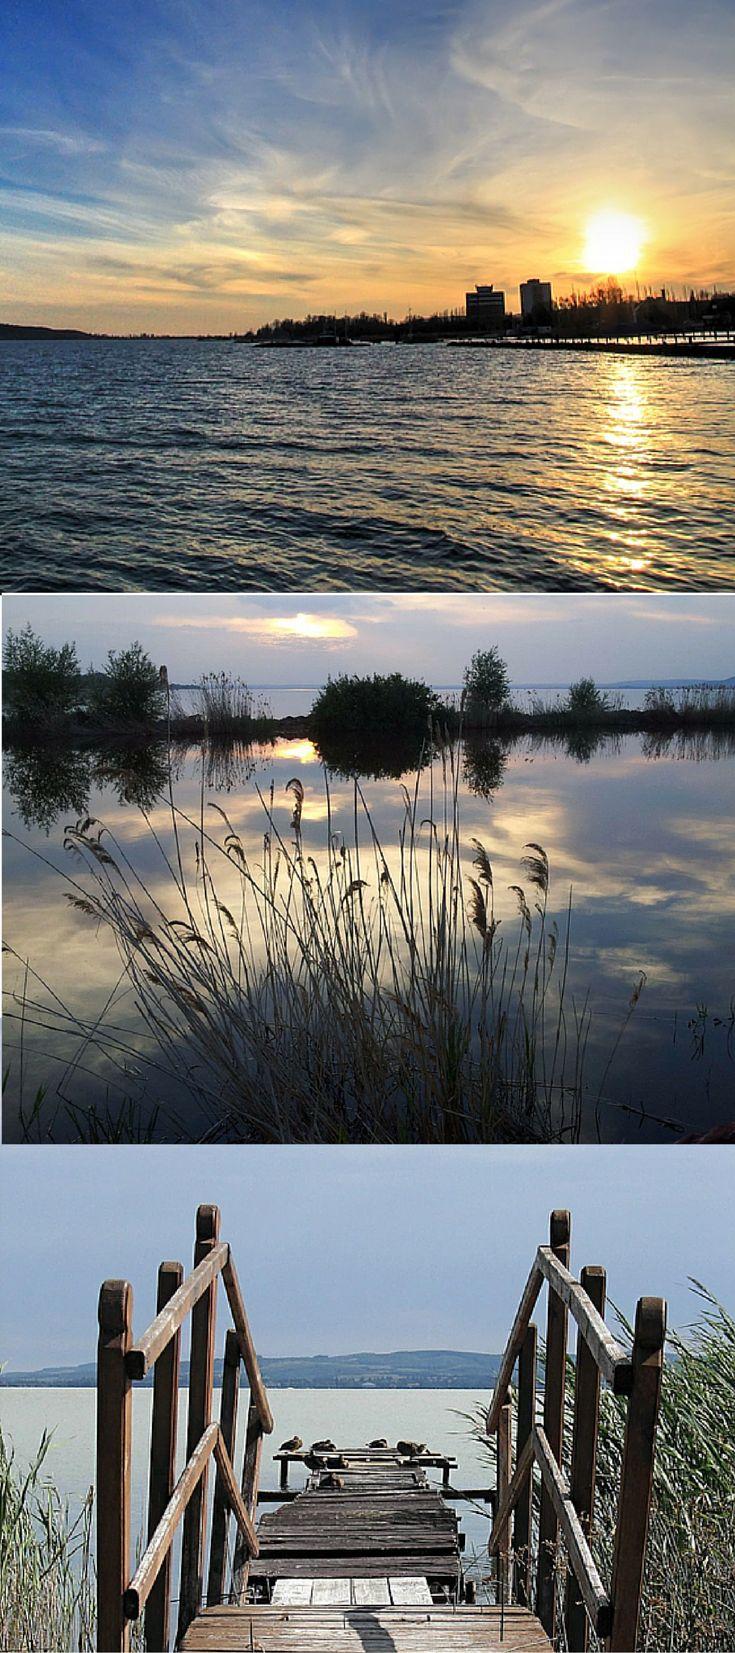 Natur, Entspannung und Campen - Urlaub am Balaton #balaton #plattensee #camping…